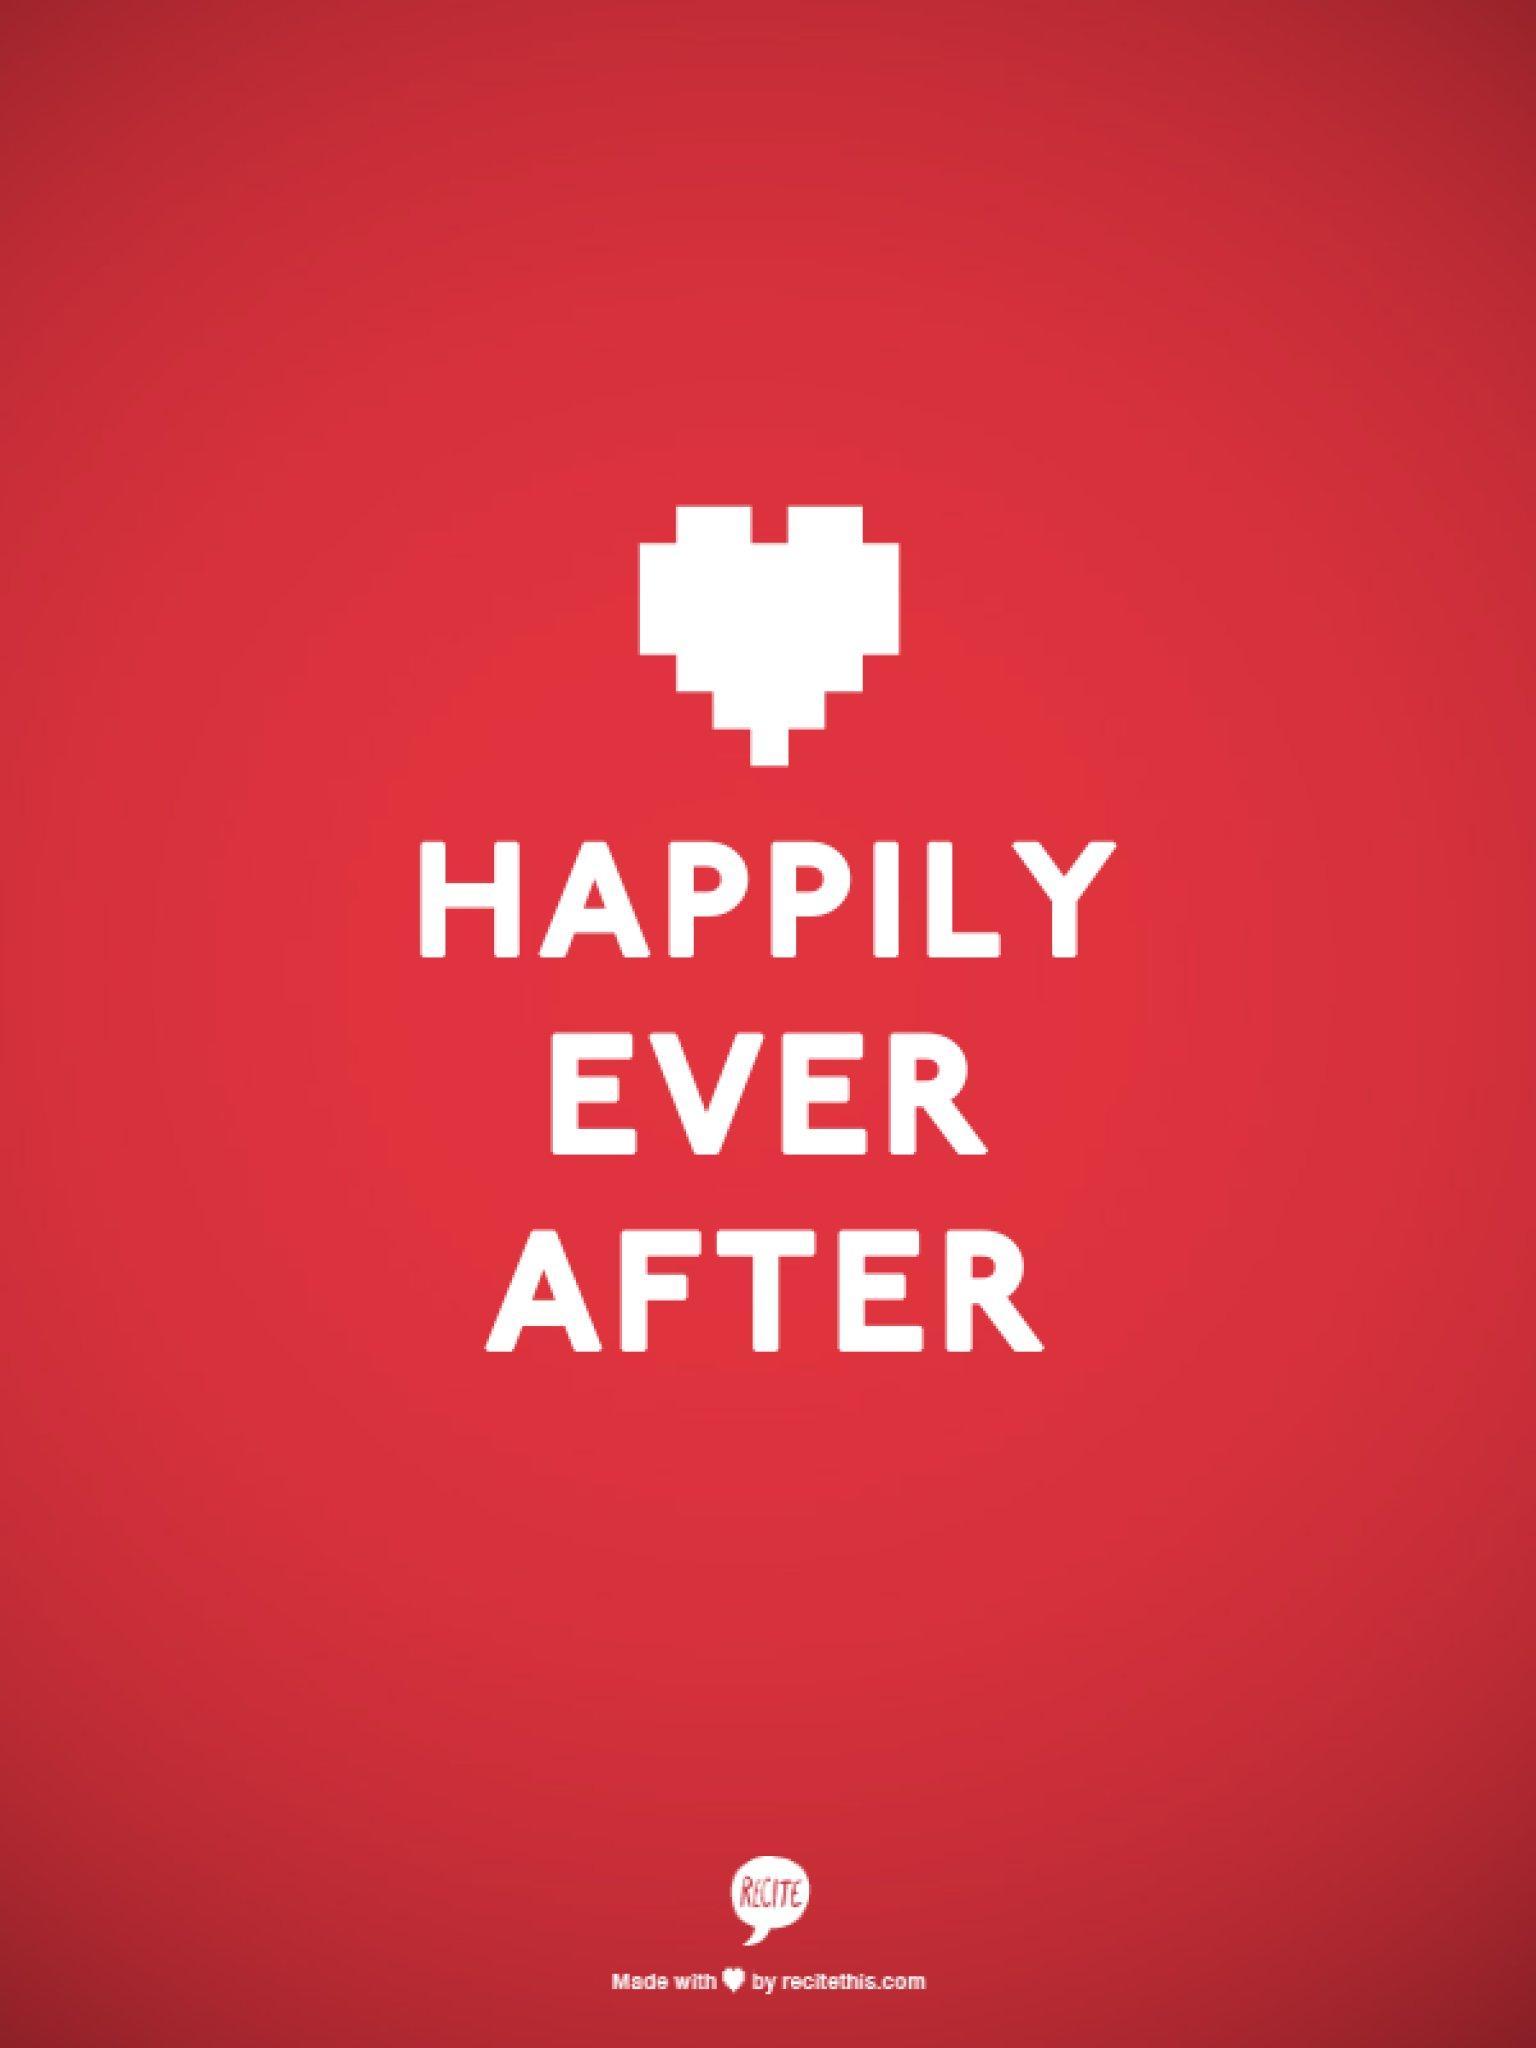 Life After Divorce Quotes Life After Divorce The 3 Words That Best Describe Postsplit Life